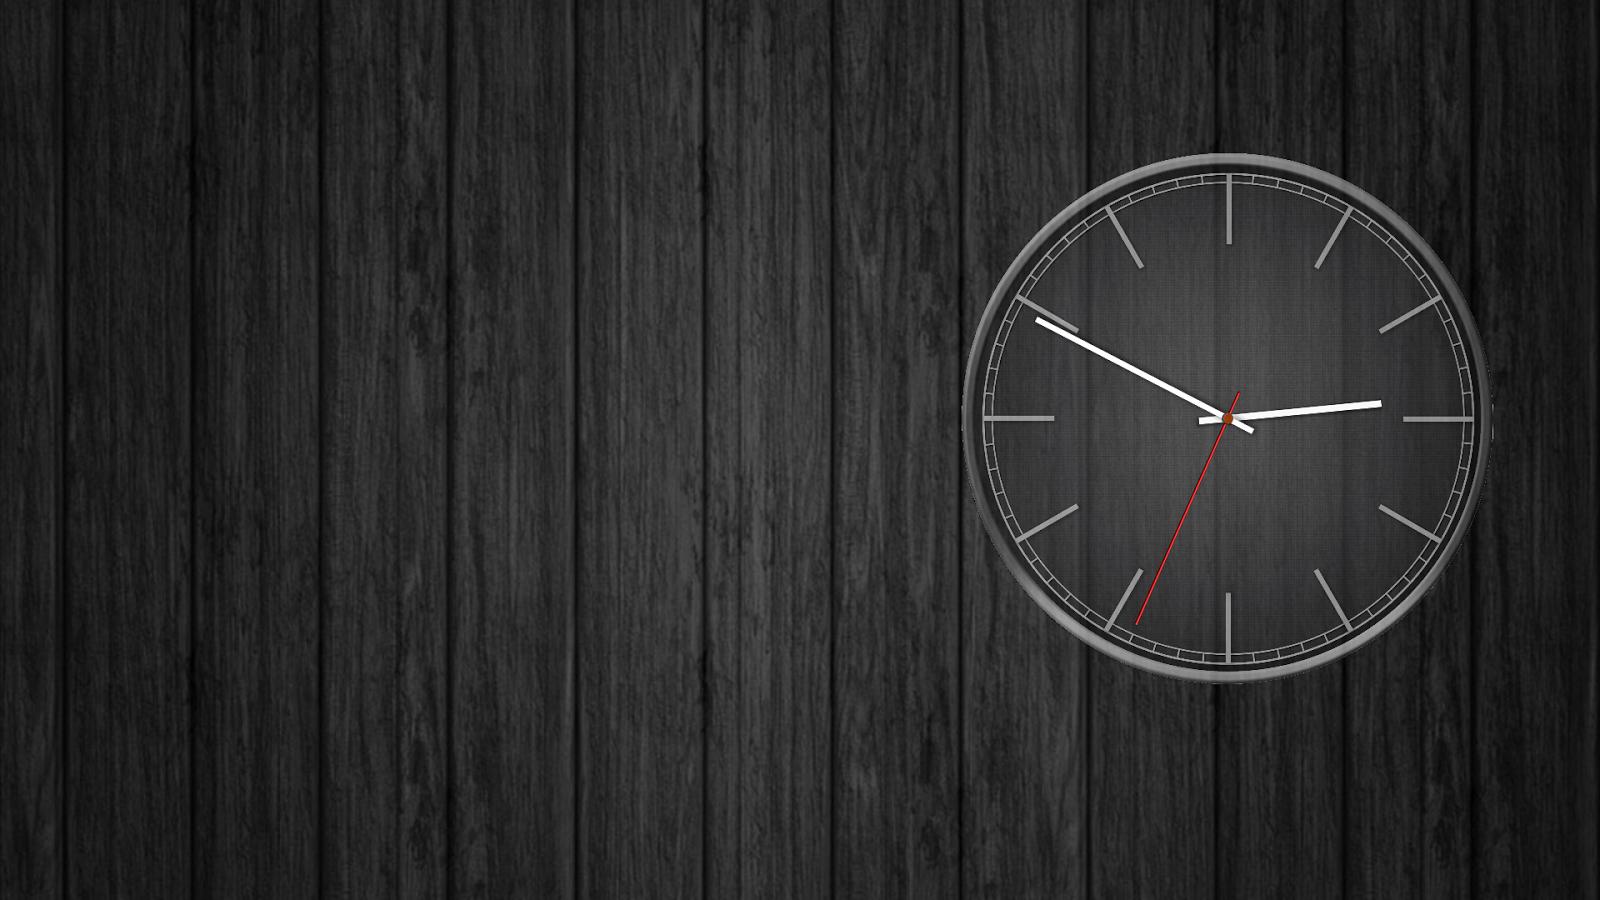 Go Launcher 3d Wallpaper Battery Saving Analog Clocks Live Wallpaper Android Apps